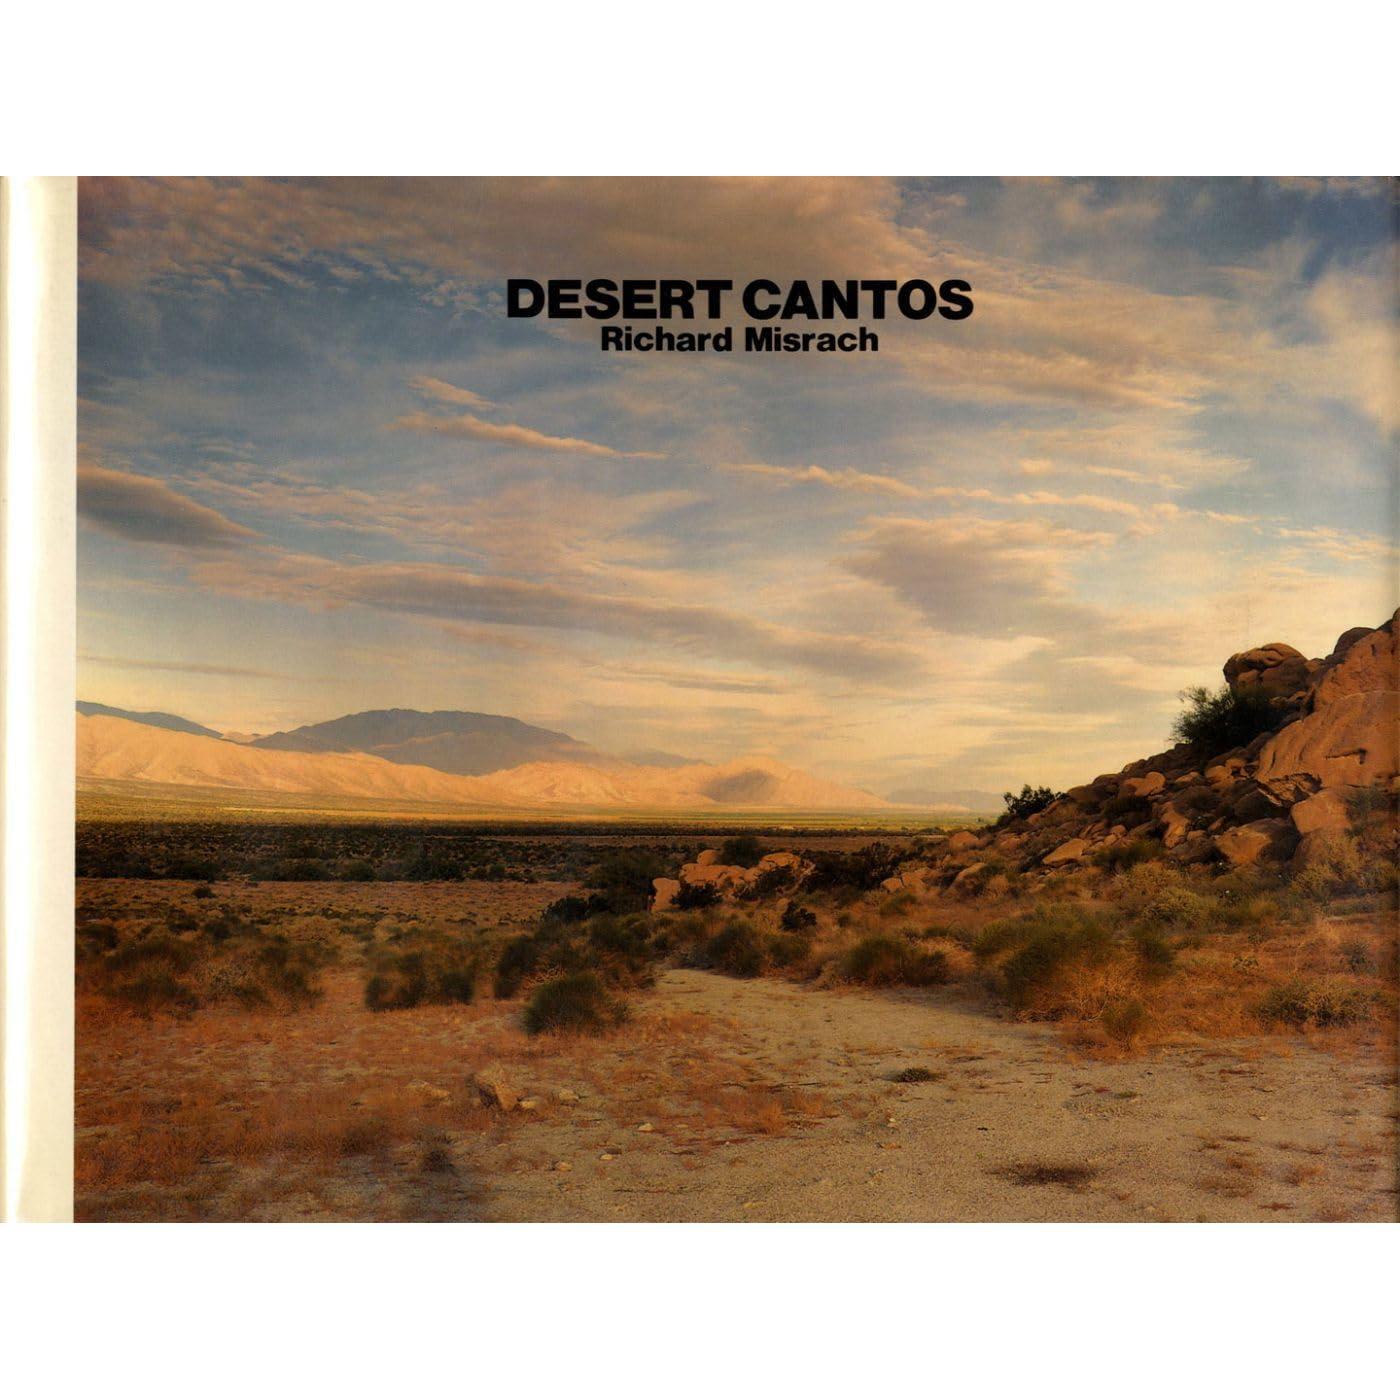 Desert Cantos by Richard Misrach